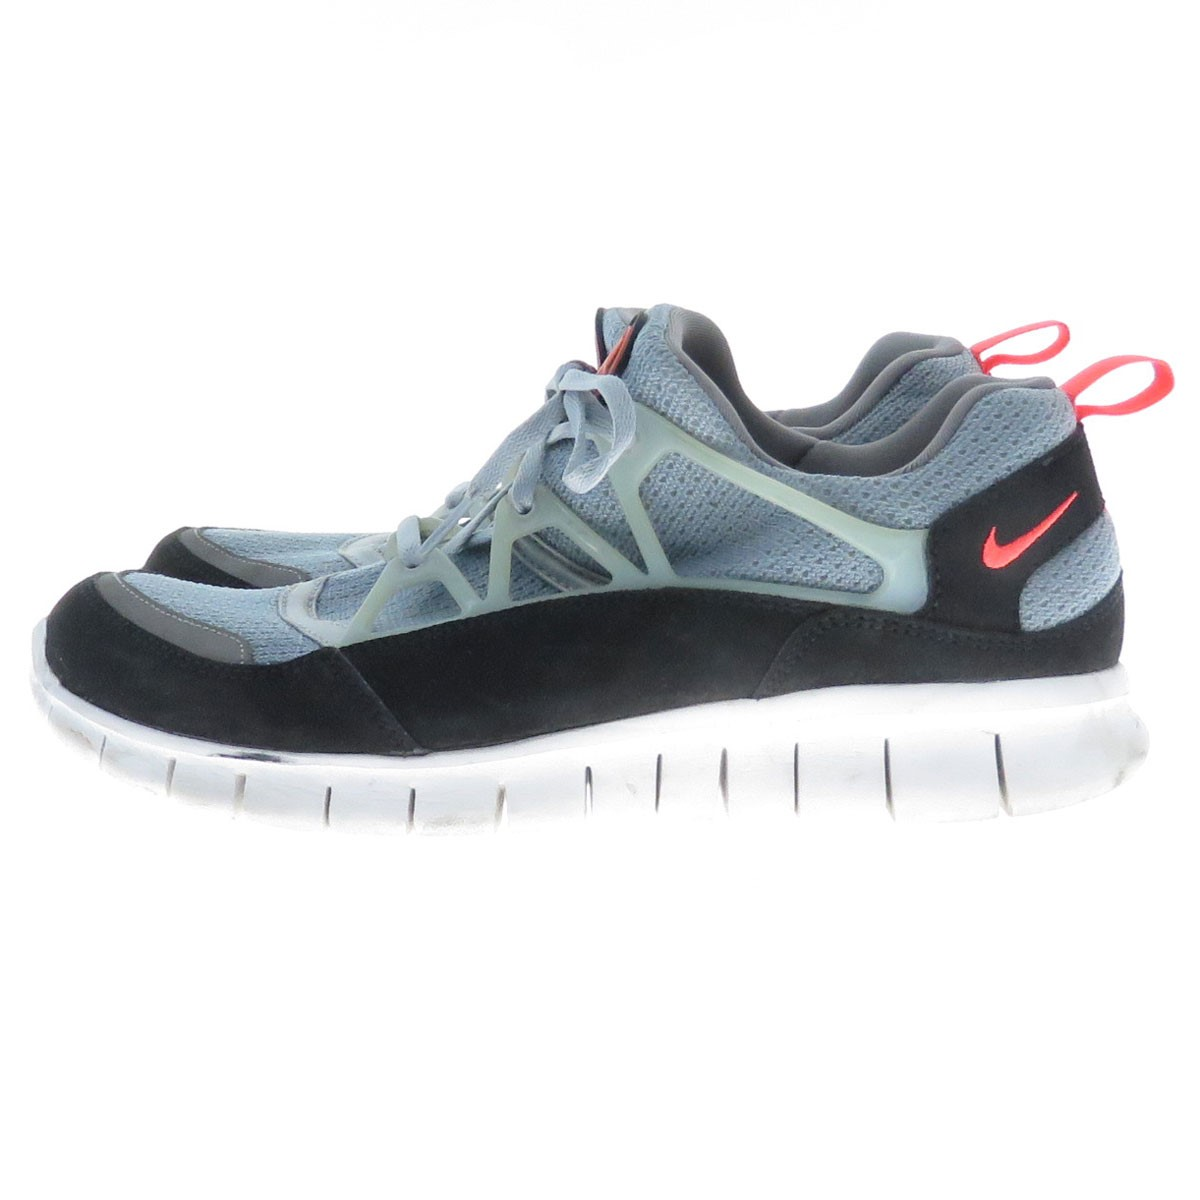 NIKE FREE HUARACHE LIGHT フリーハラチライトグレー X black size: 27 5cm (Nike)